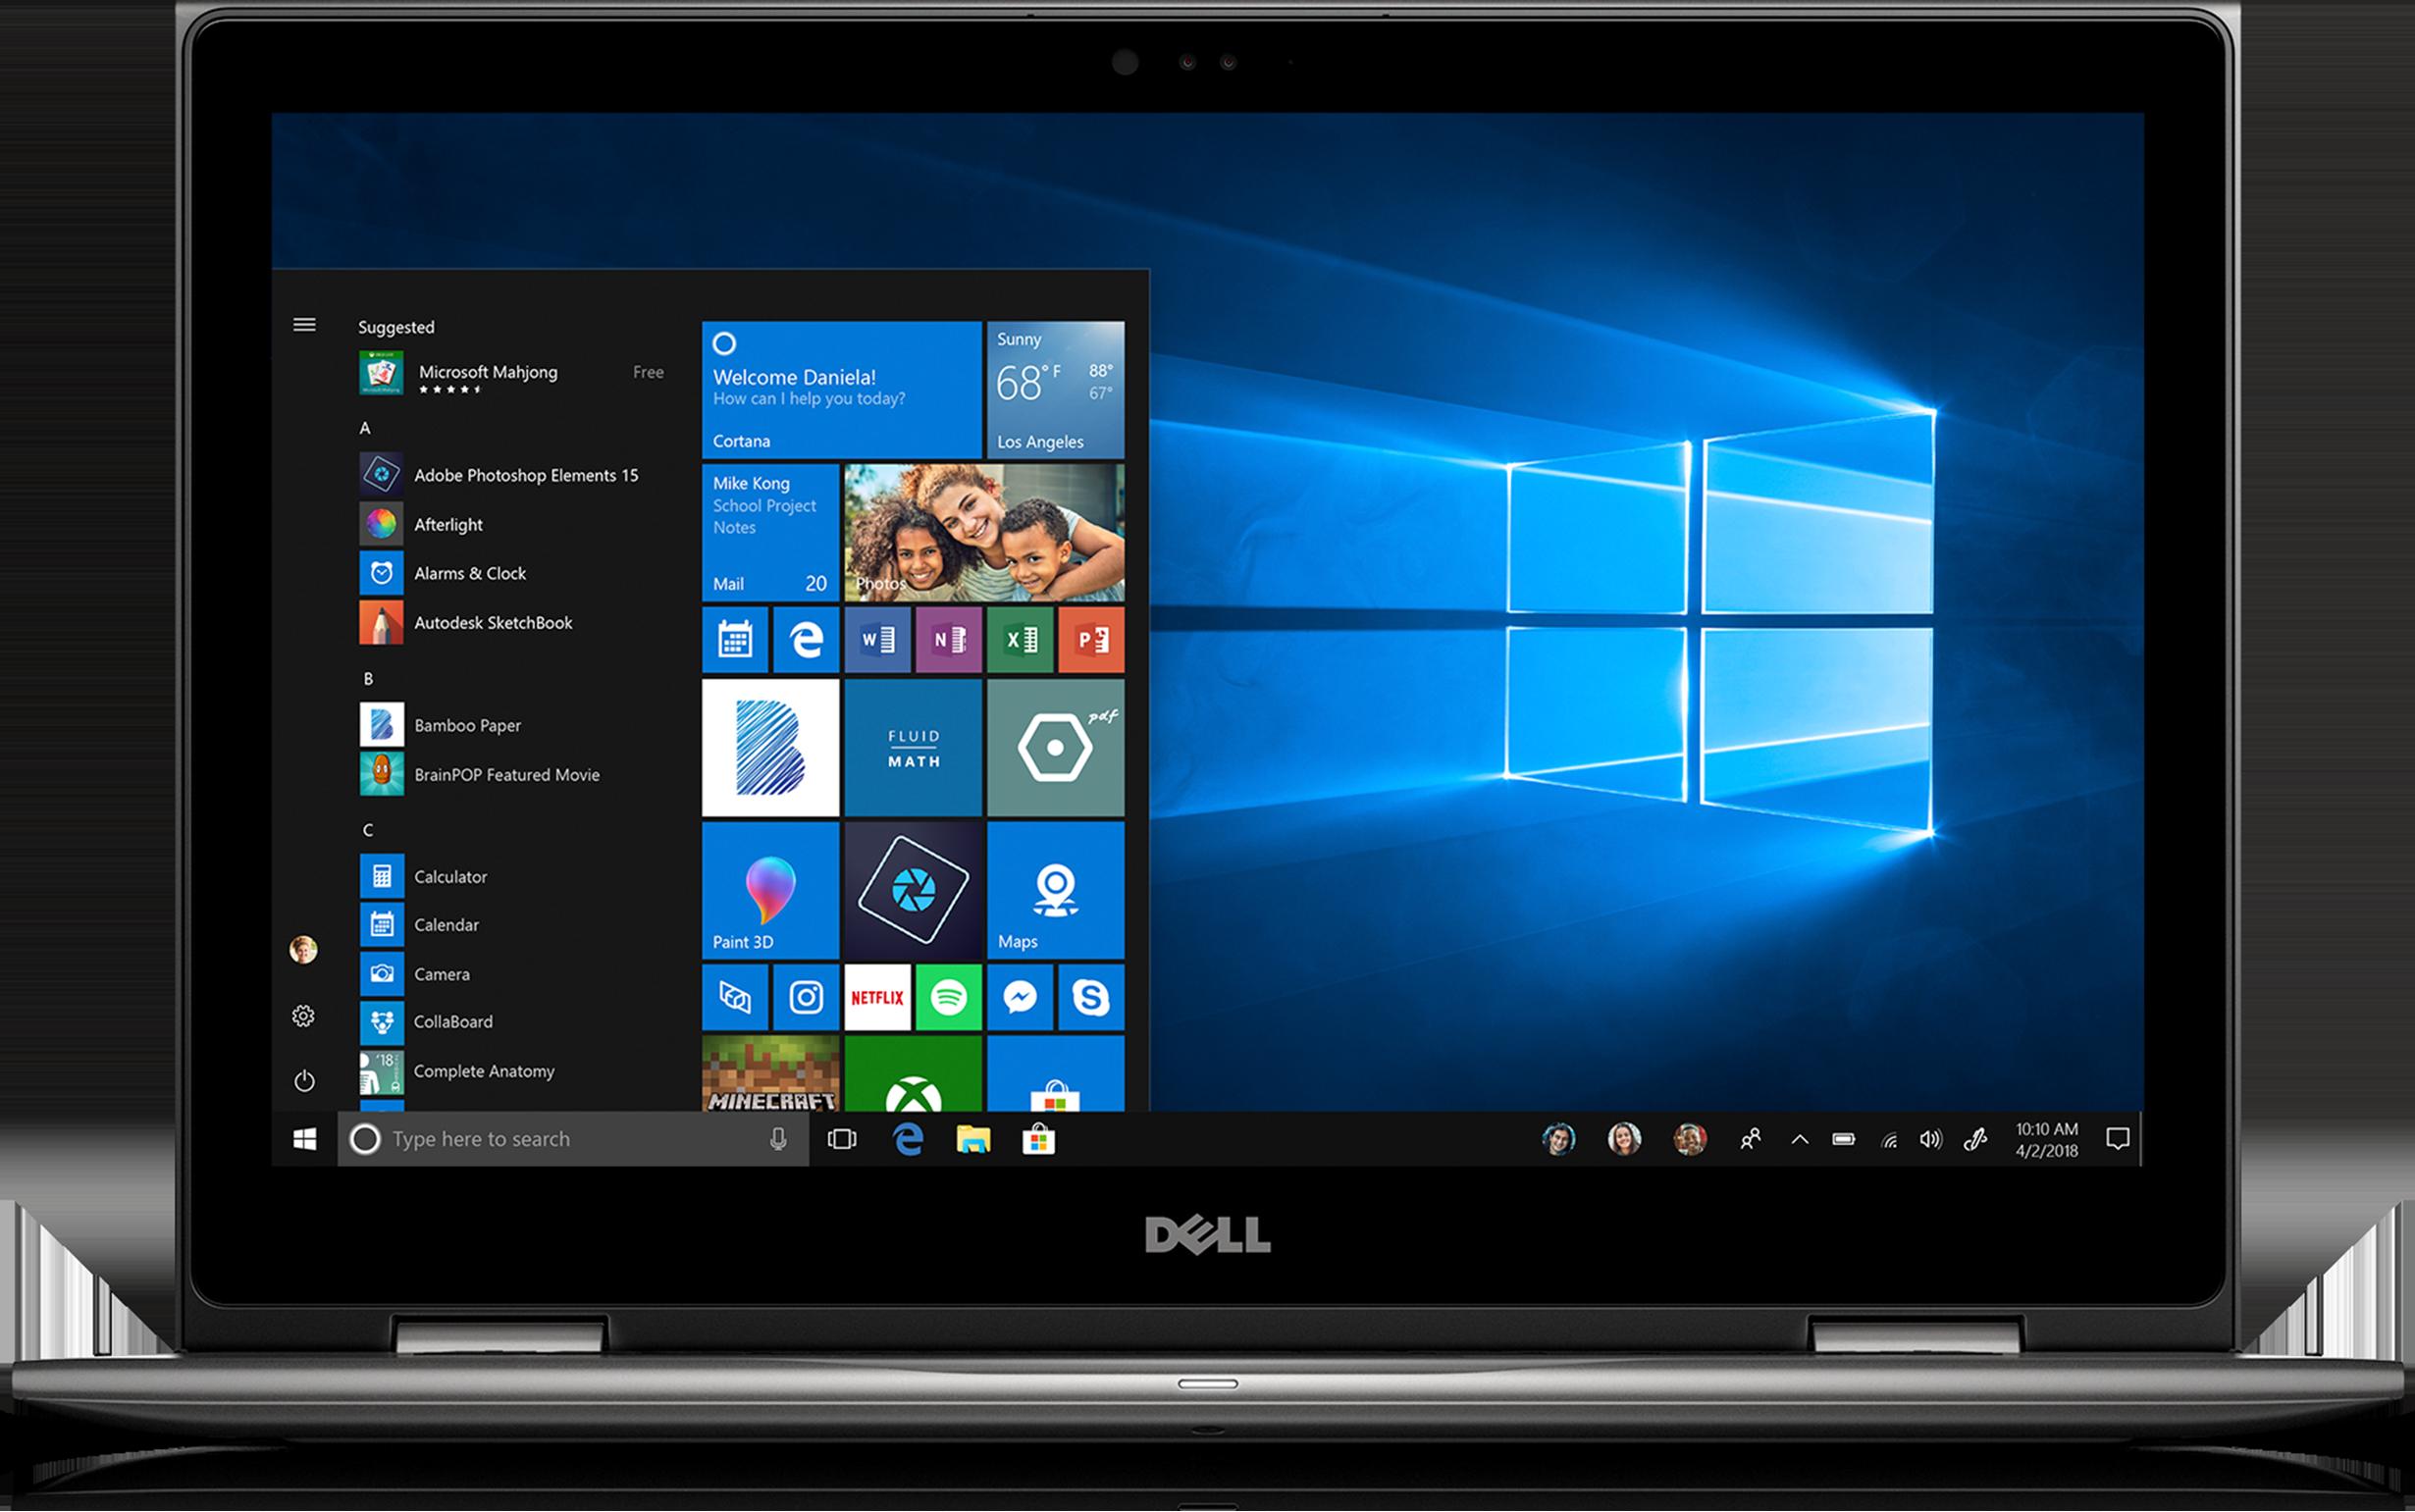 Dell Inspiron 15 5579 2 in 1 PC• 15.6-inch Full HD touchscreen • Intel i5 8th Gen • 8GB memory/1TB HDD